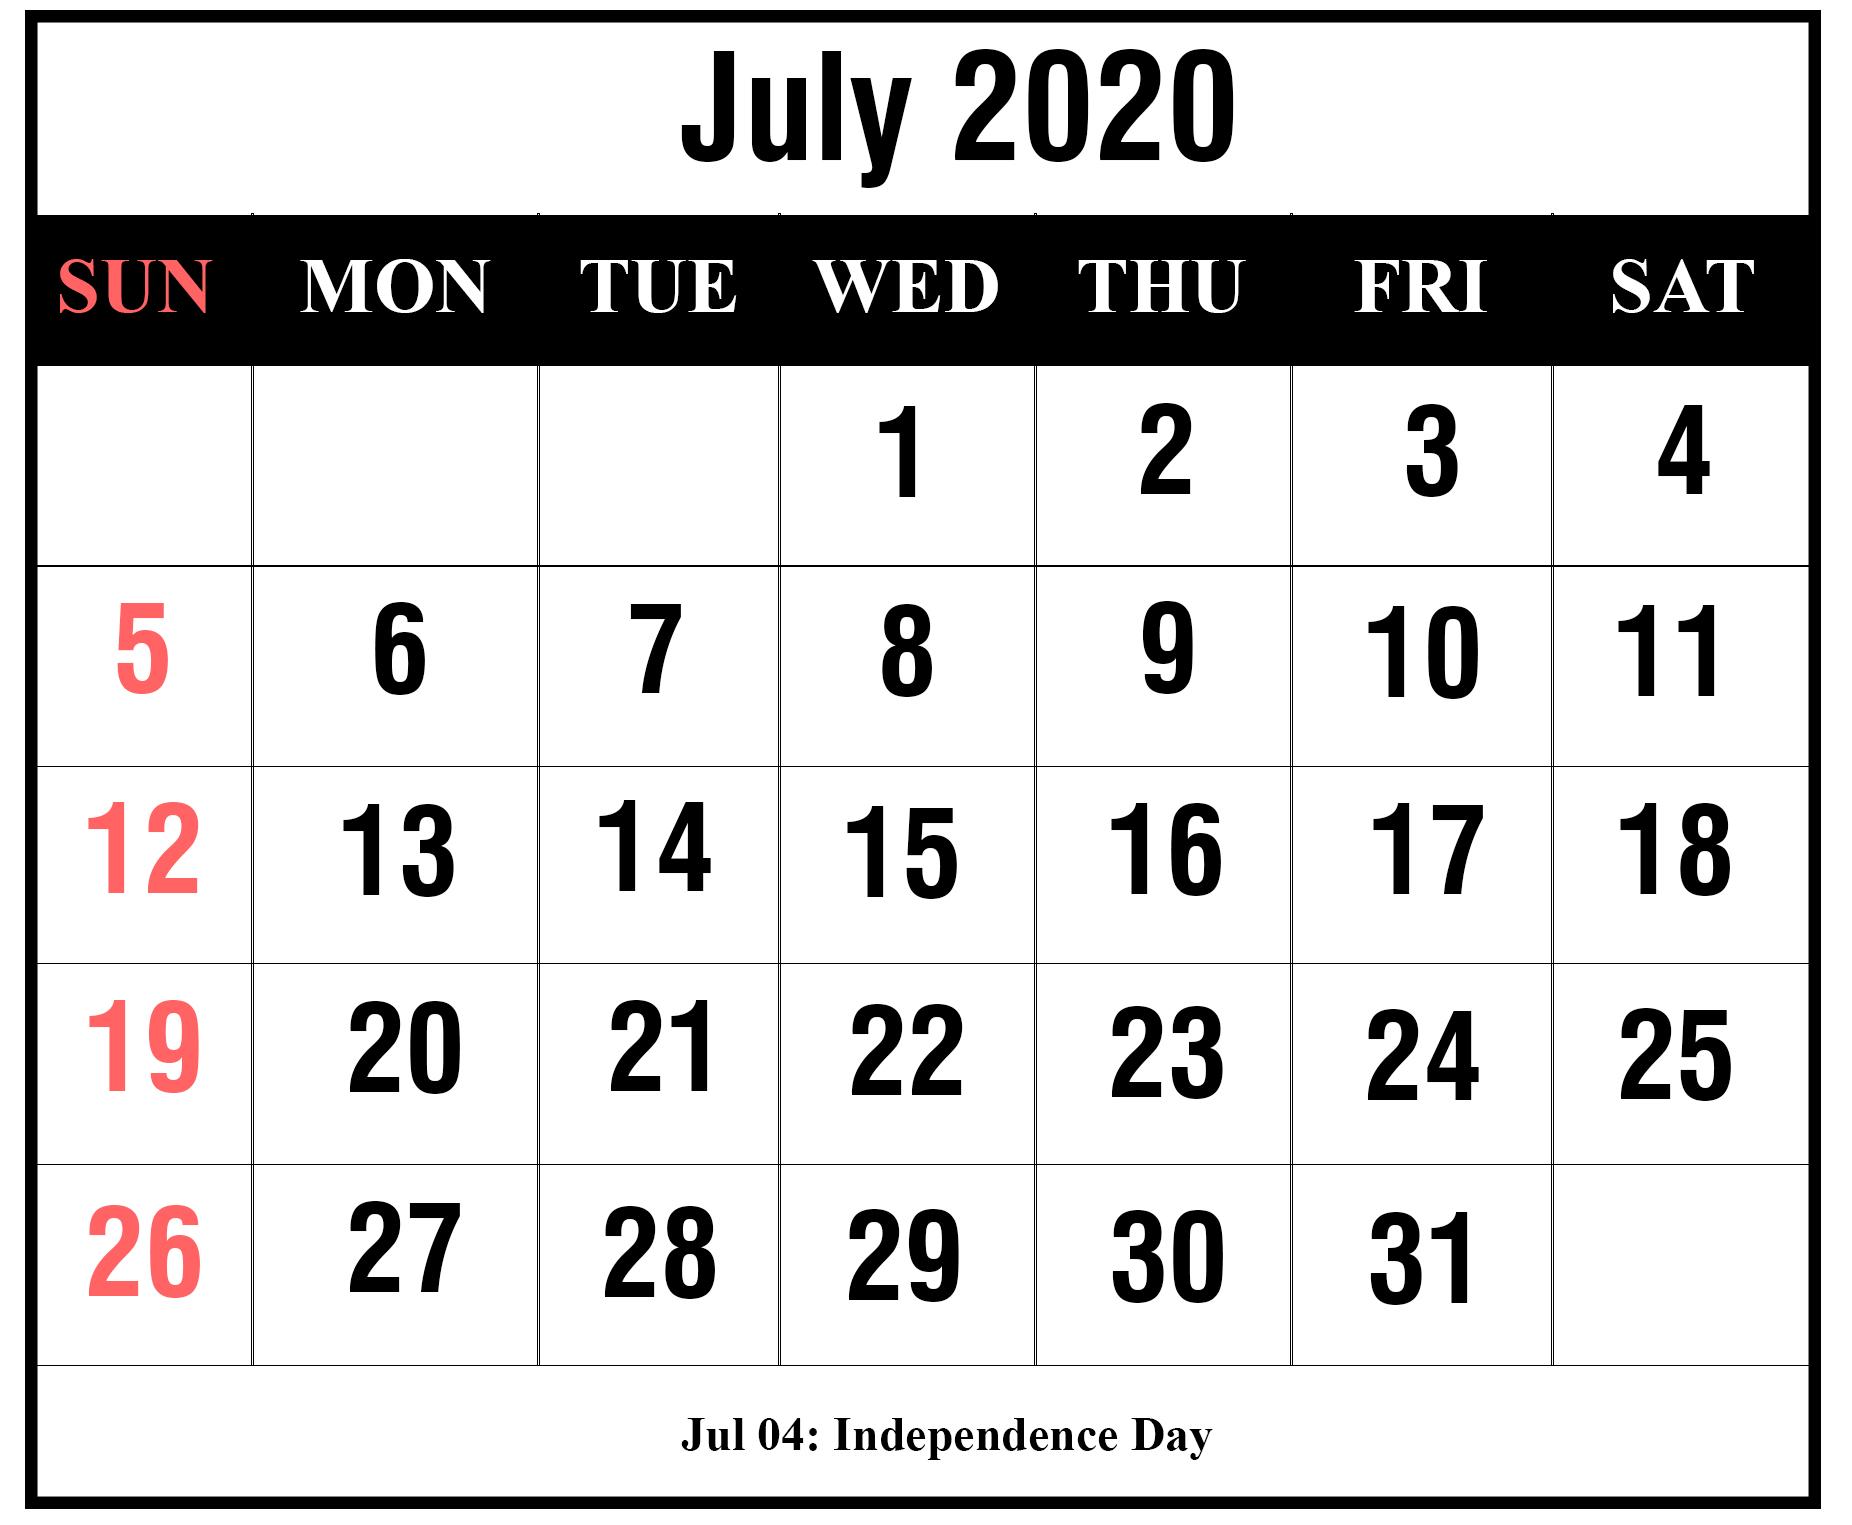 [%Free Printable July 2020 Calendar Templates [Pdf,word,excel|July 2020 Calendar With Holidays|July 2020 Calendar With Holidays%]